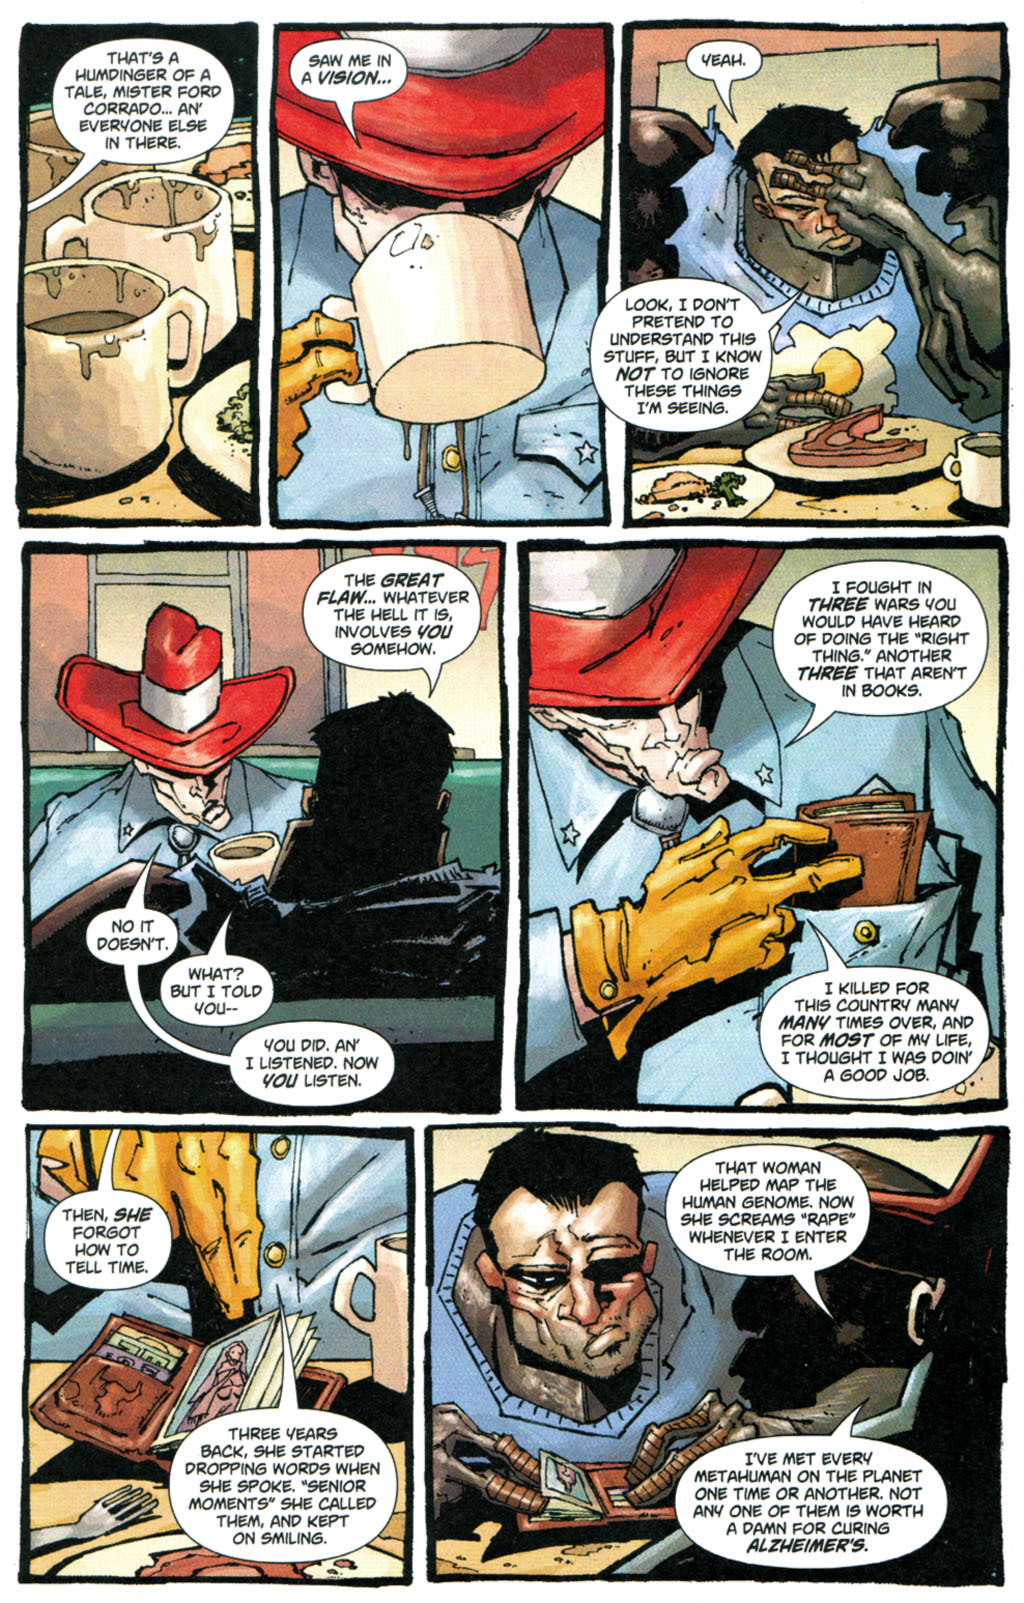 Read online Enginehead comic -  Issue #5 - 17